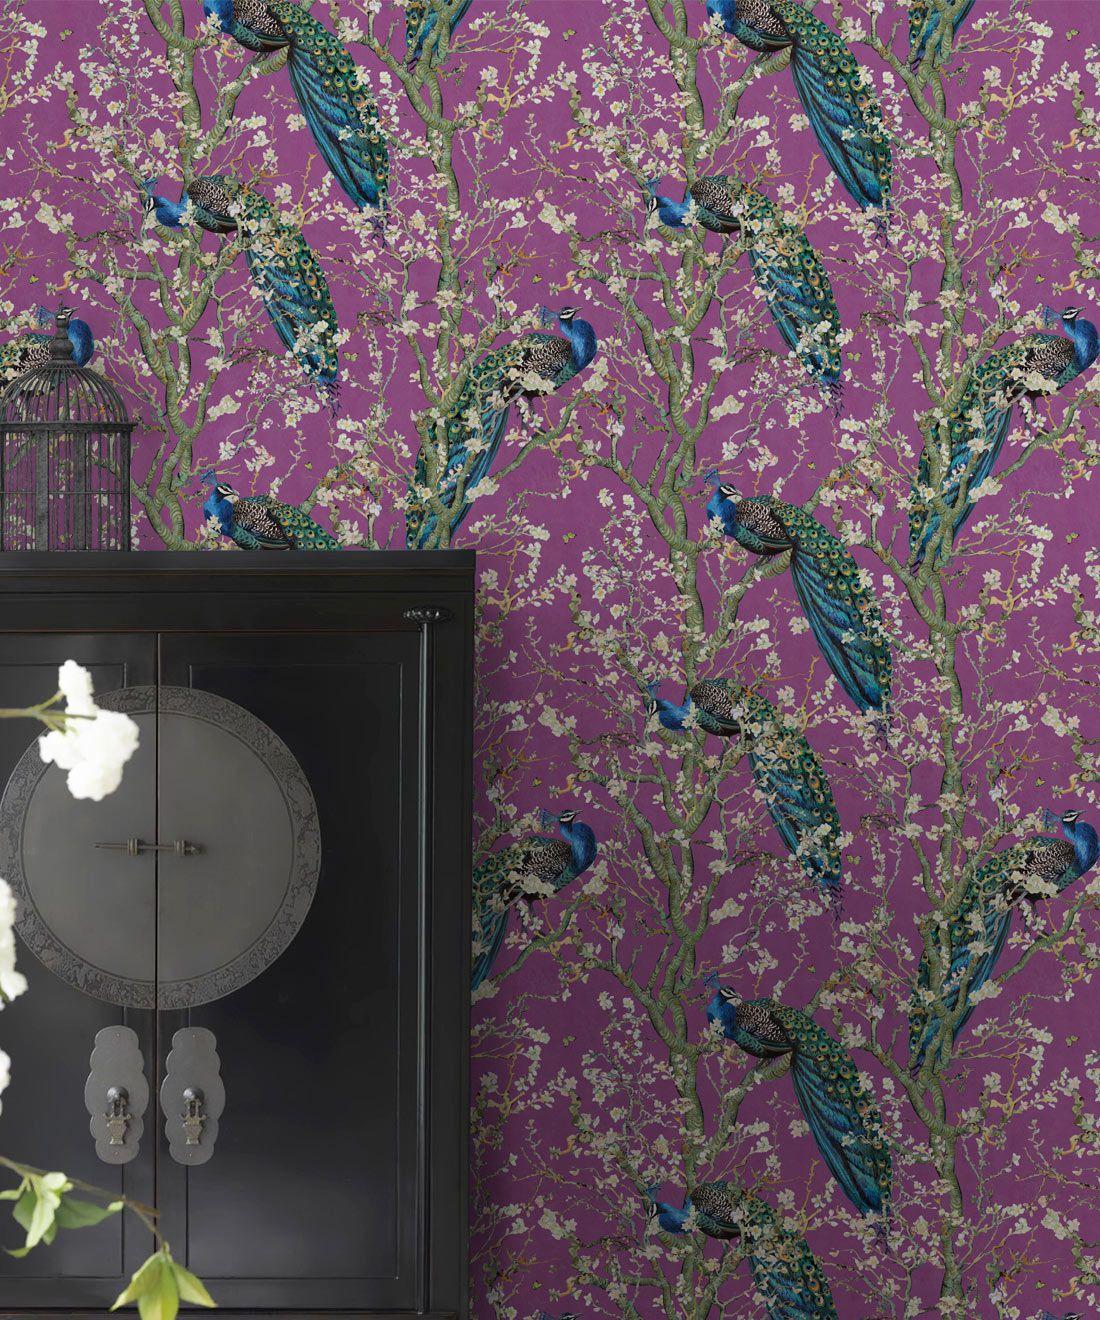 Almond Blossom Wallpaper • Chinoiserie Wallpaper • Wallpaper with Peacocks • Purple Eggplant Wallpaper •Insitu